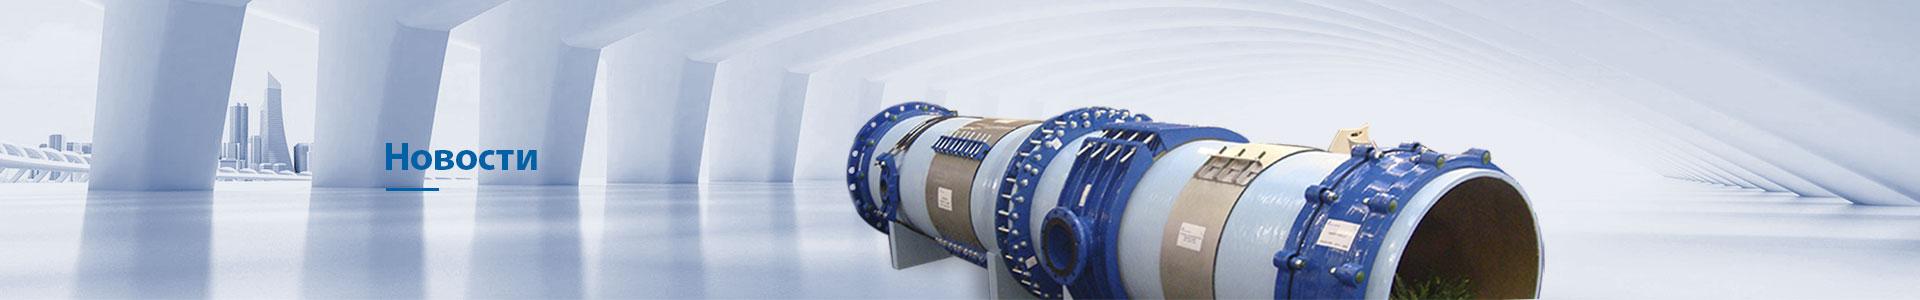 Qingdao Judberd Machinery Co., Ltd.